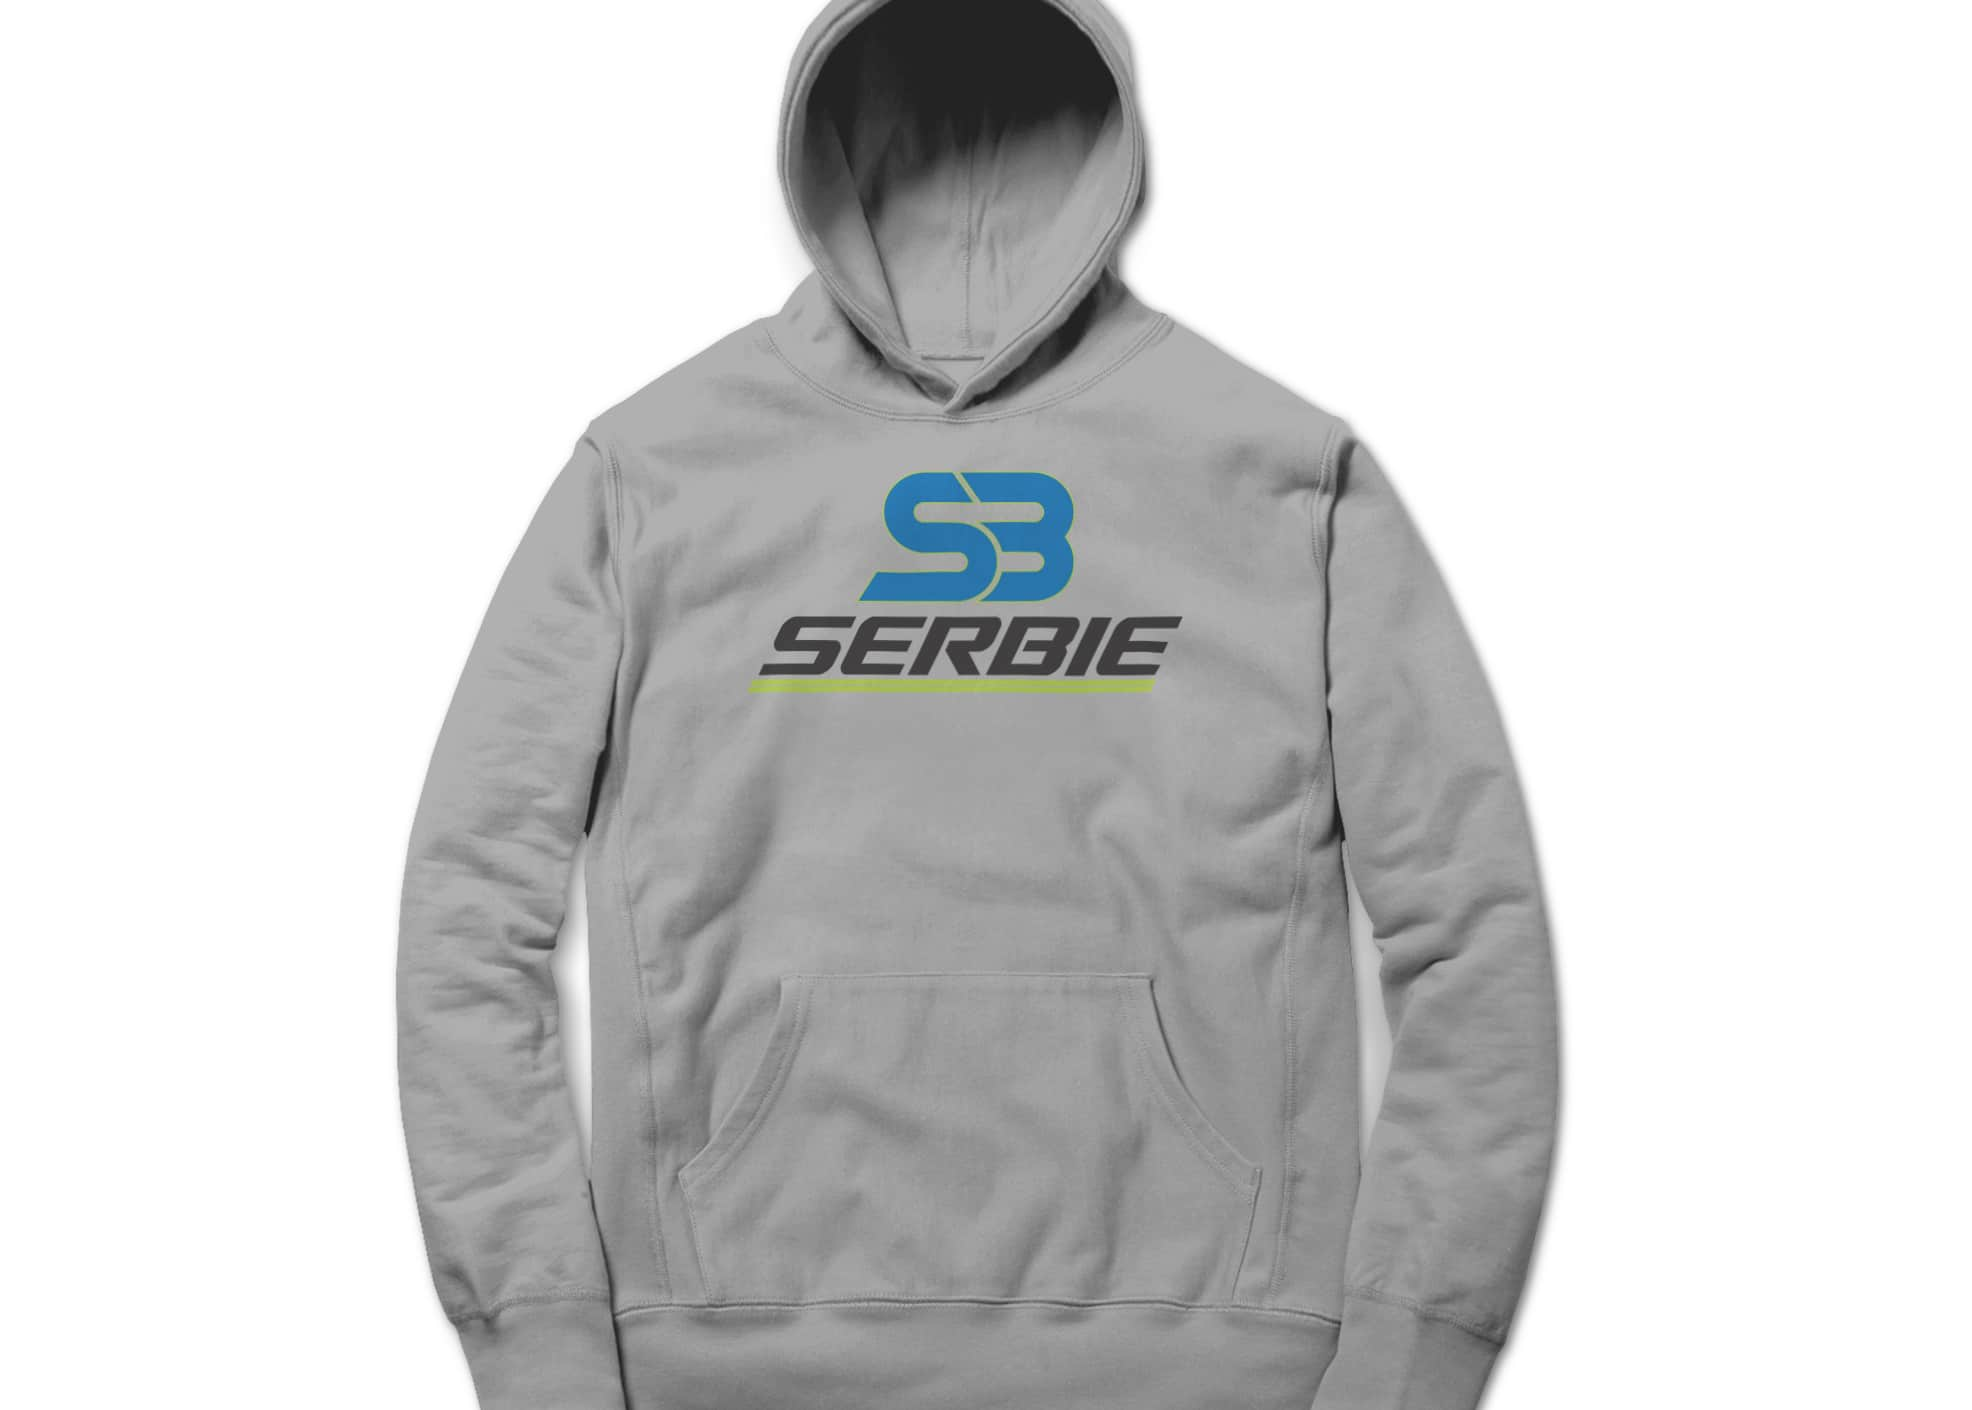 Serbie serbielogo3 1592771328